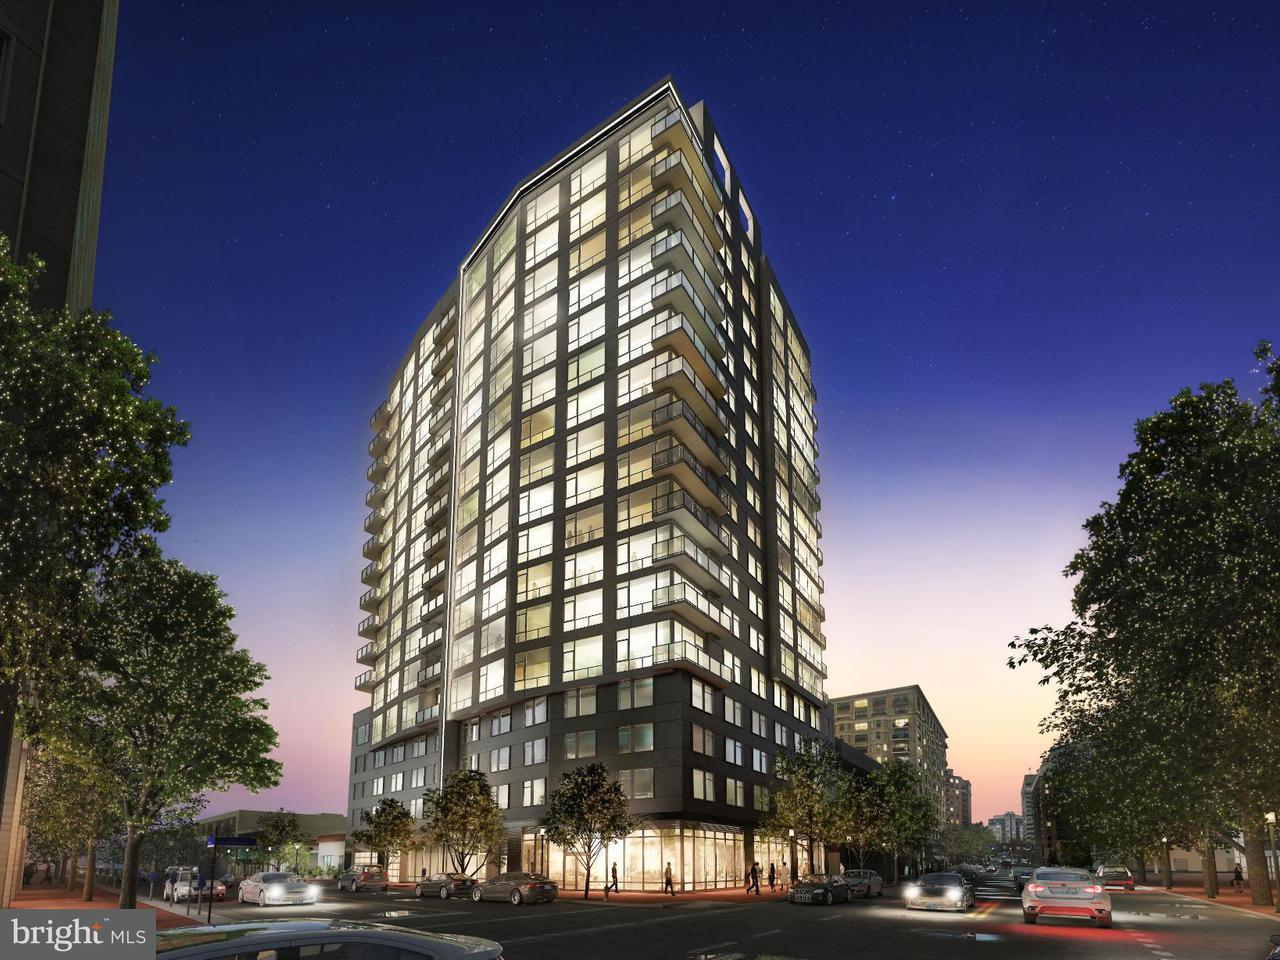 Condominium for Sale at 4960 Fairmont Ave #1504 4960 Fairmont Ave #1504 Bethesda, Maryland 20814 United States